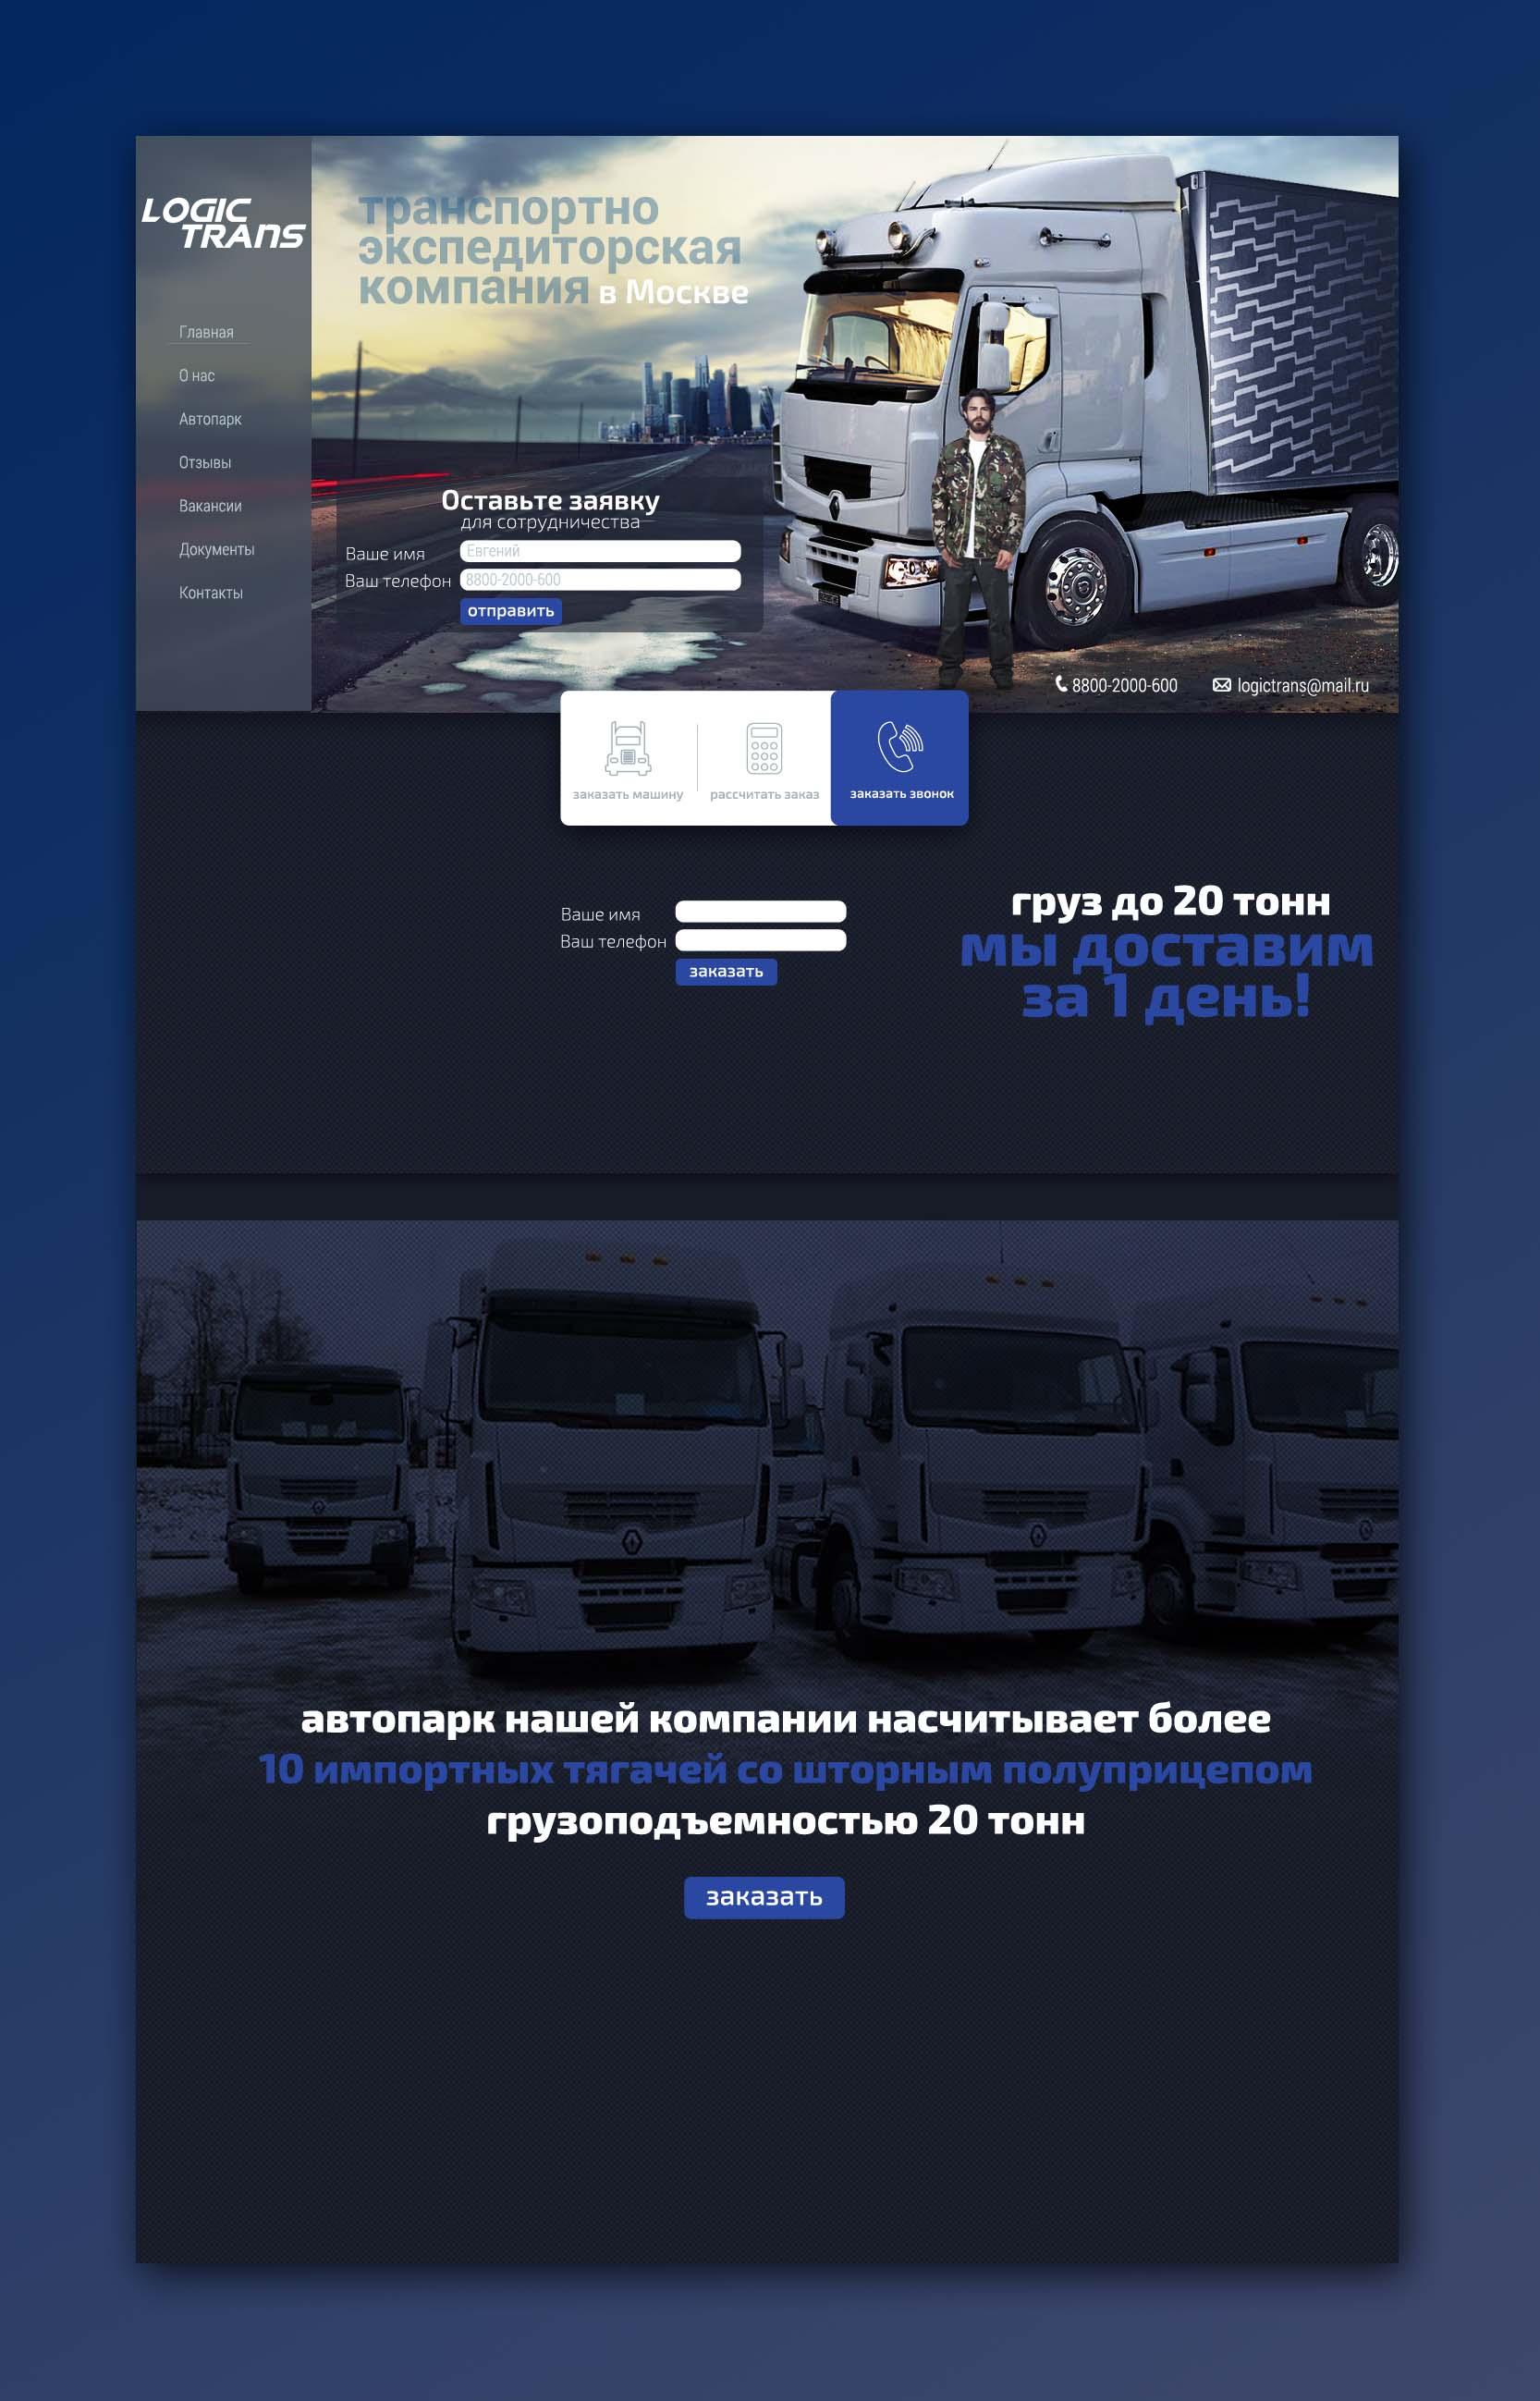 Дизайн сайта транспортно-экспедиторской компании ЛогикТранс фото f_1455a45067c5f859.jpg